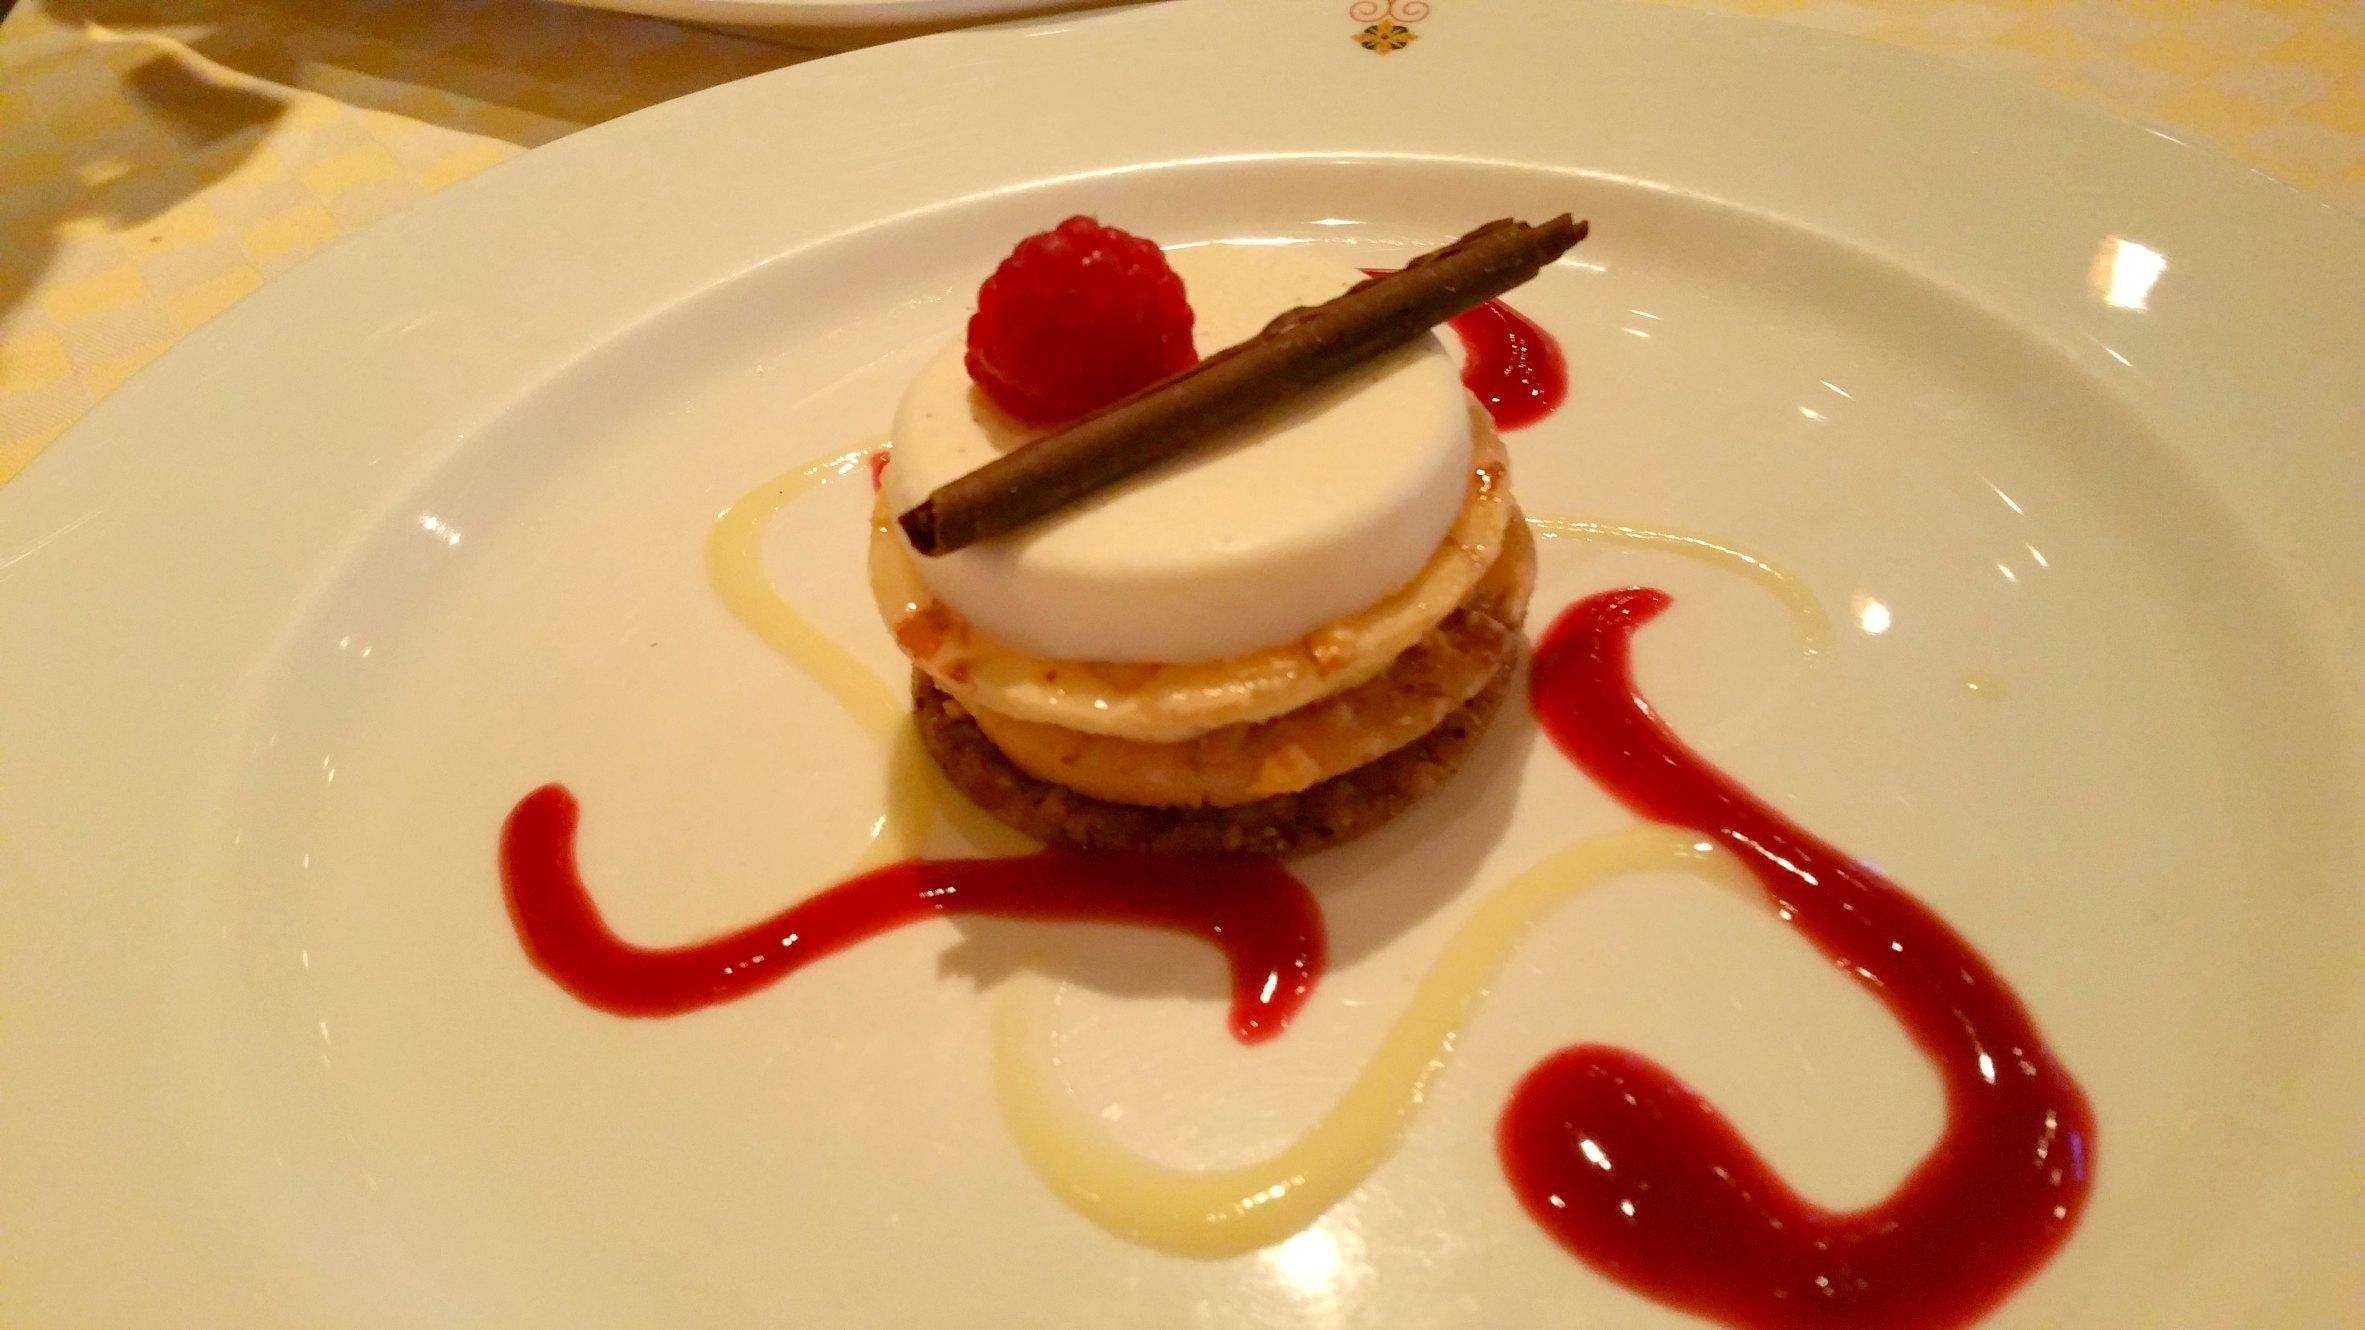 Sabatini's crown princess specialty desserts